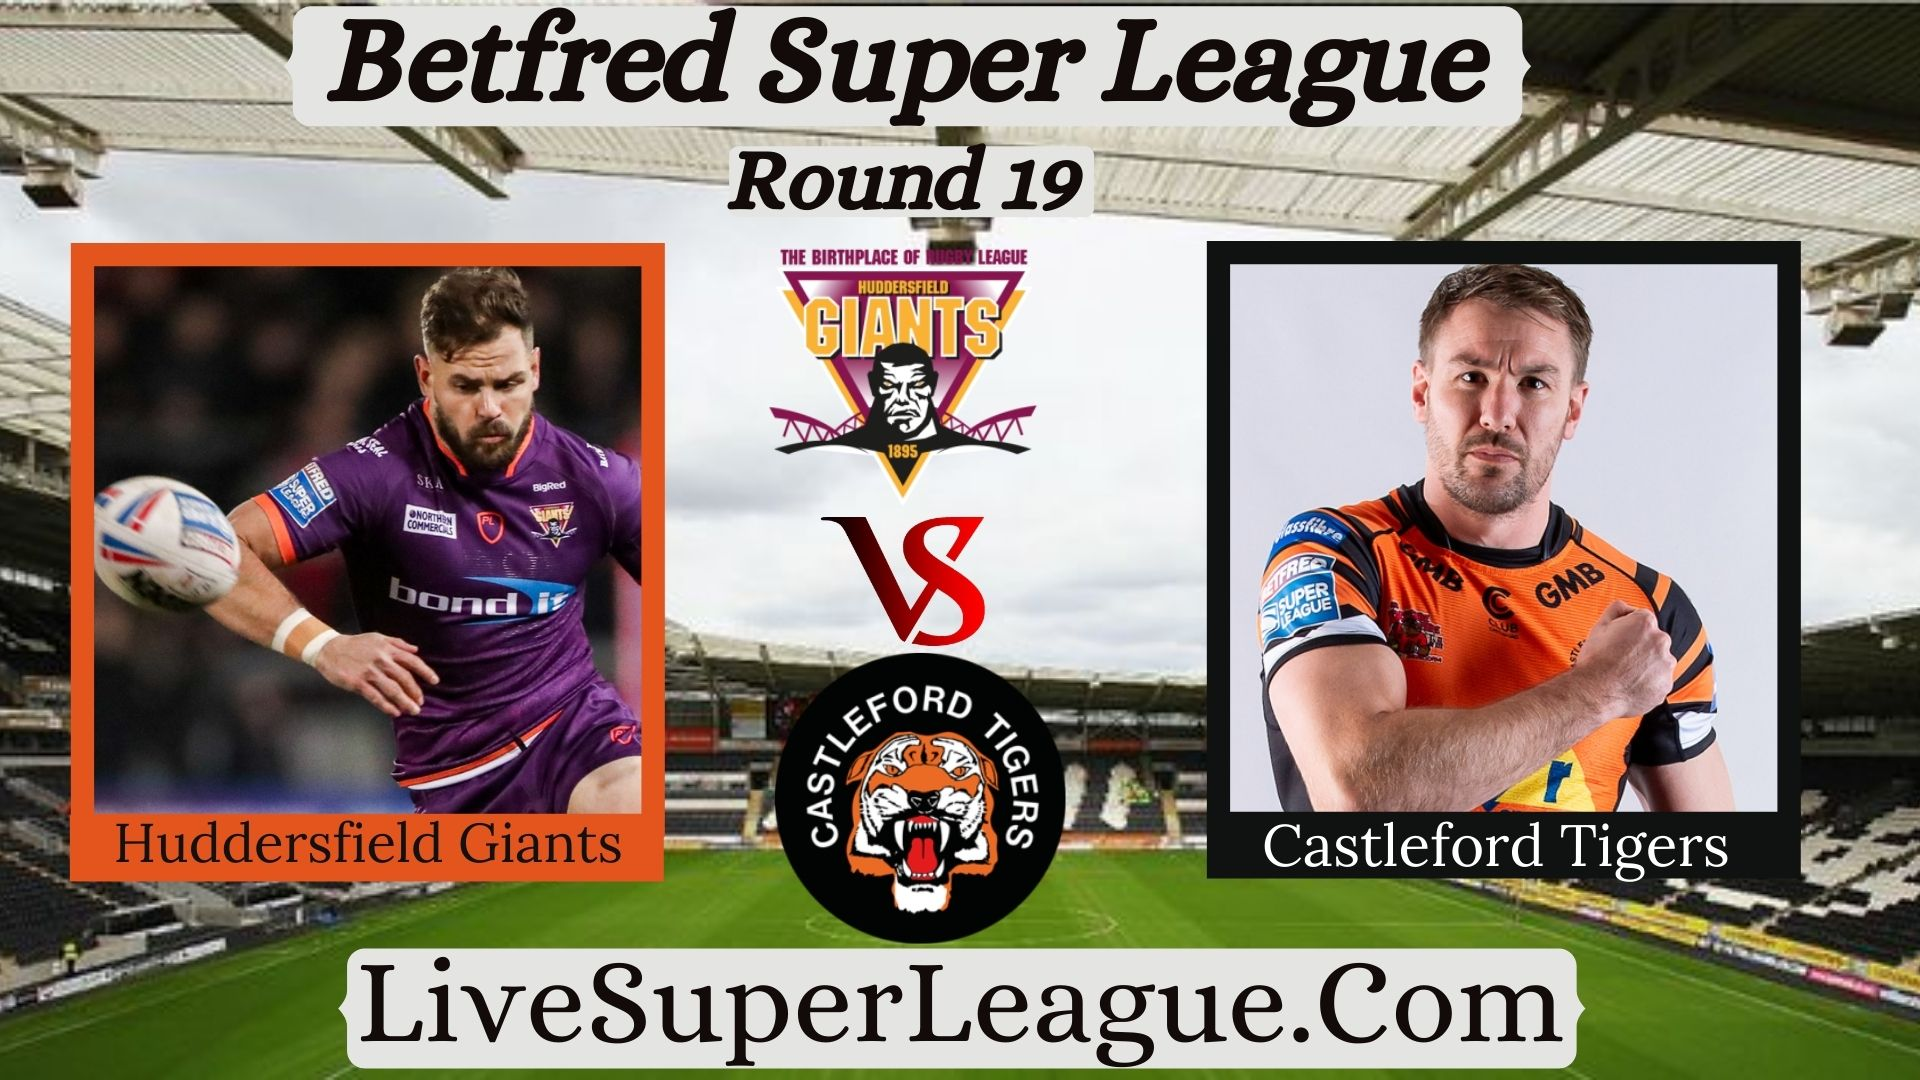 live-castleford-tigers-vs-huddersfield-giants-coverage